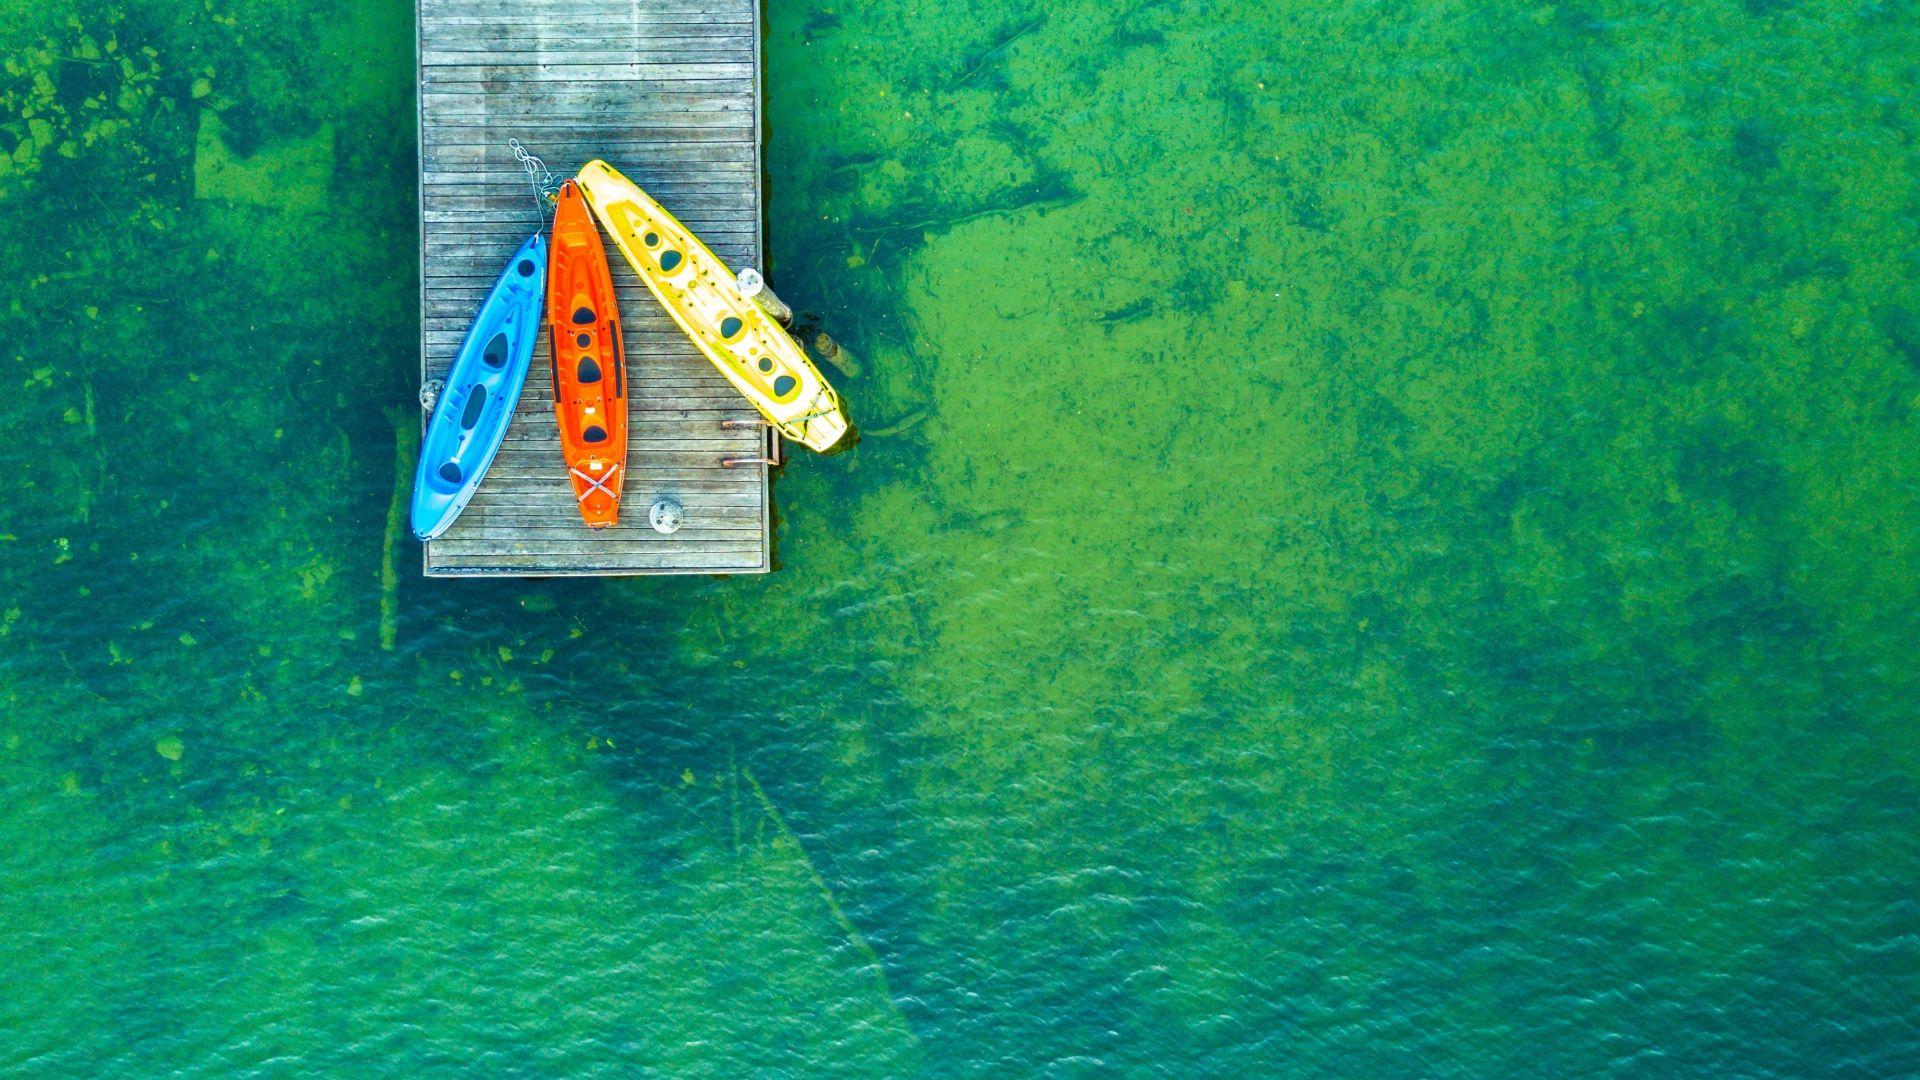 Wallpaper Green lake, boats, aerial view, holiday, outdoor, 4k